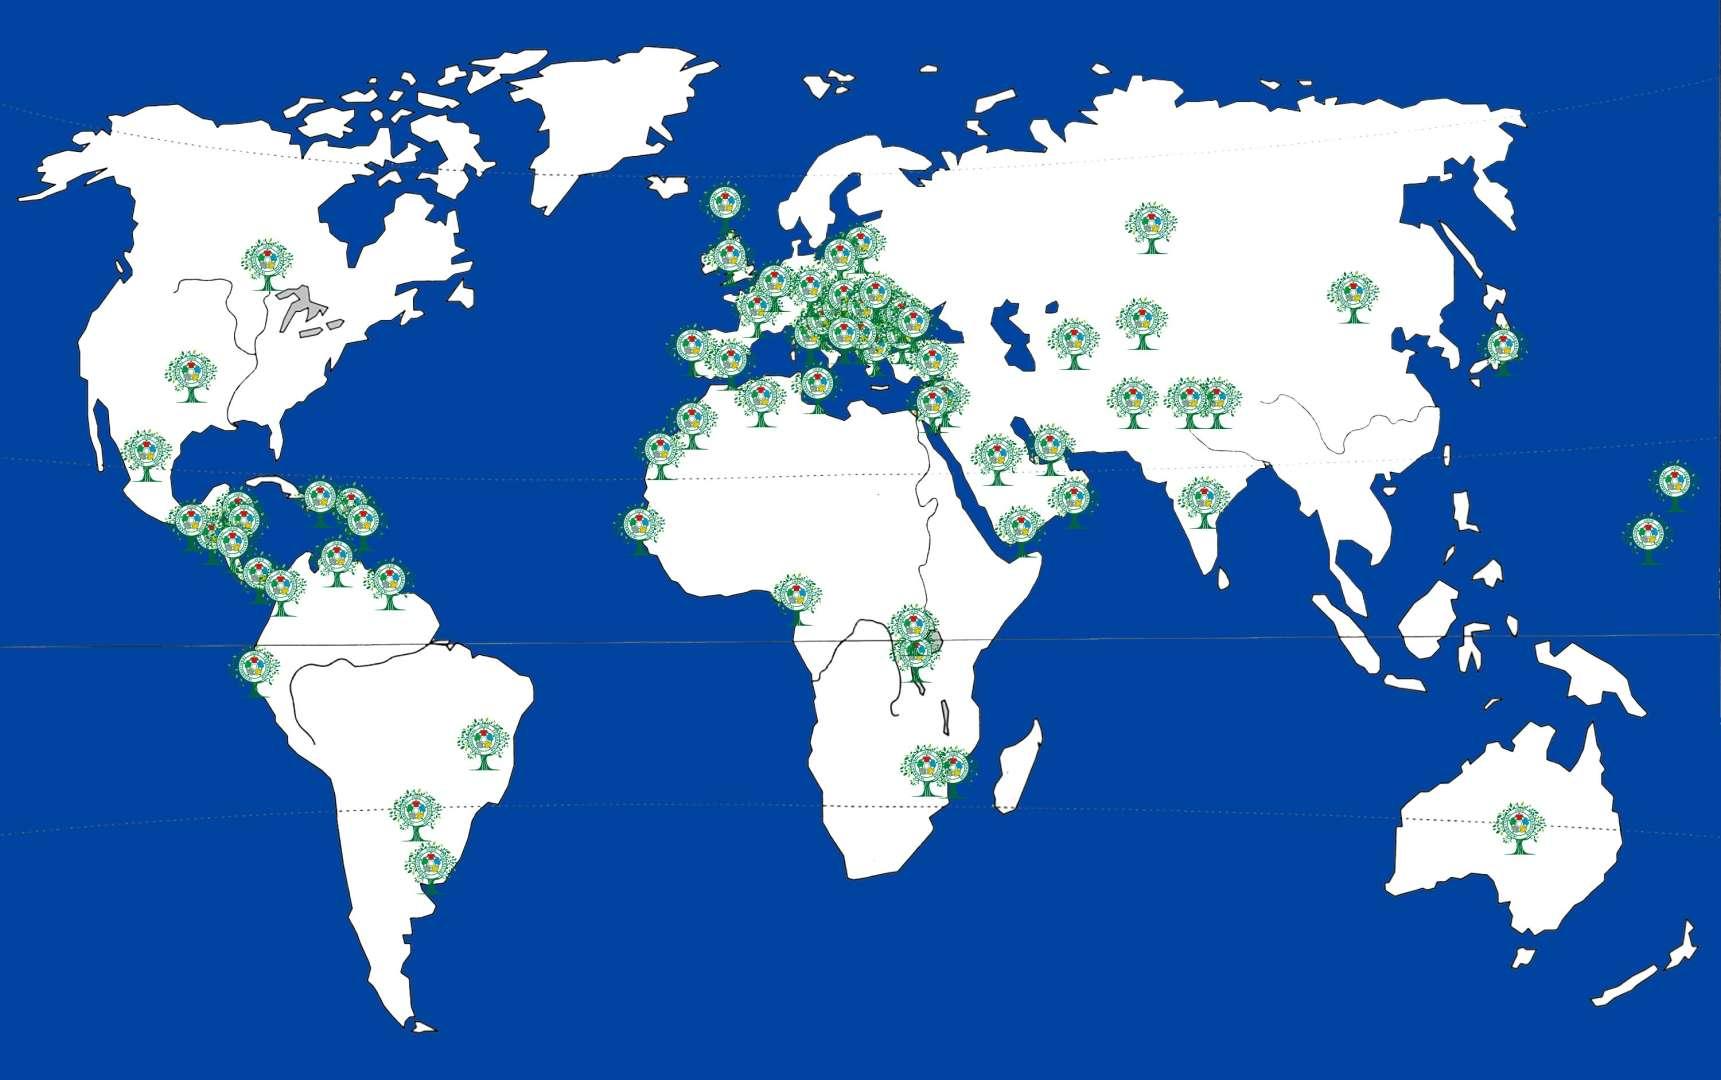 Judo Community plants more than 5300 Trees for a Better ... on tree art, tree africa, tree wallpapers, kandy sri lanka map, tree house, tree world app, tree world book, warframe map, tree kangaroo map, tree mind map, tree white, create a tree map, tree usa, tree zone map, tree japan, tree world critters, tree of life map, tree globe, tree climbing goats united states,